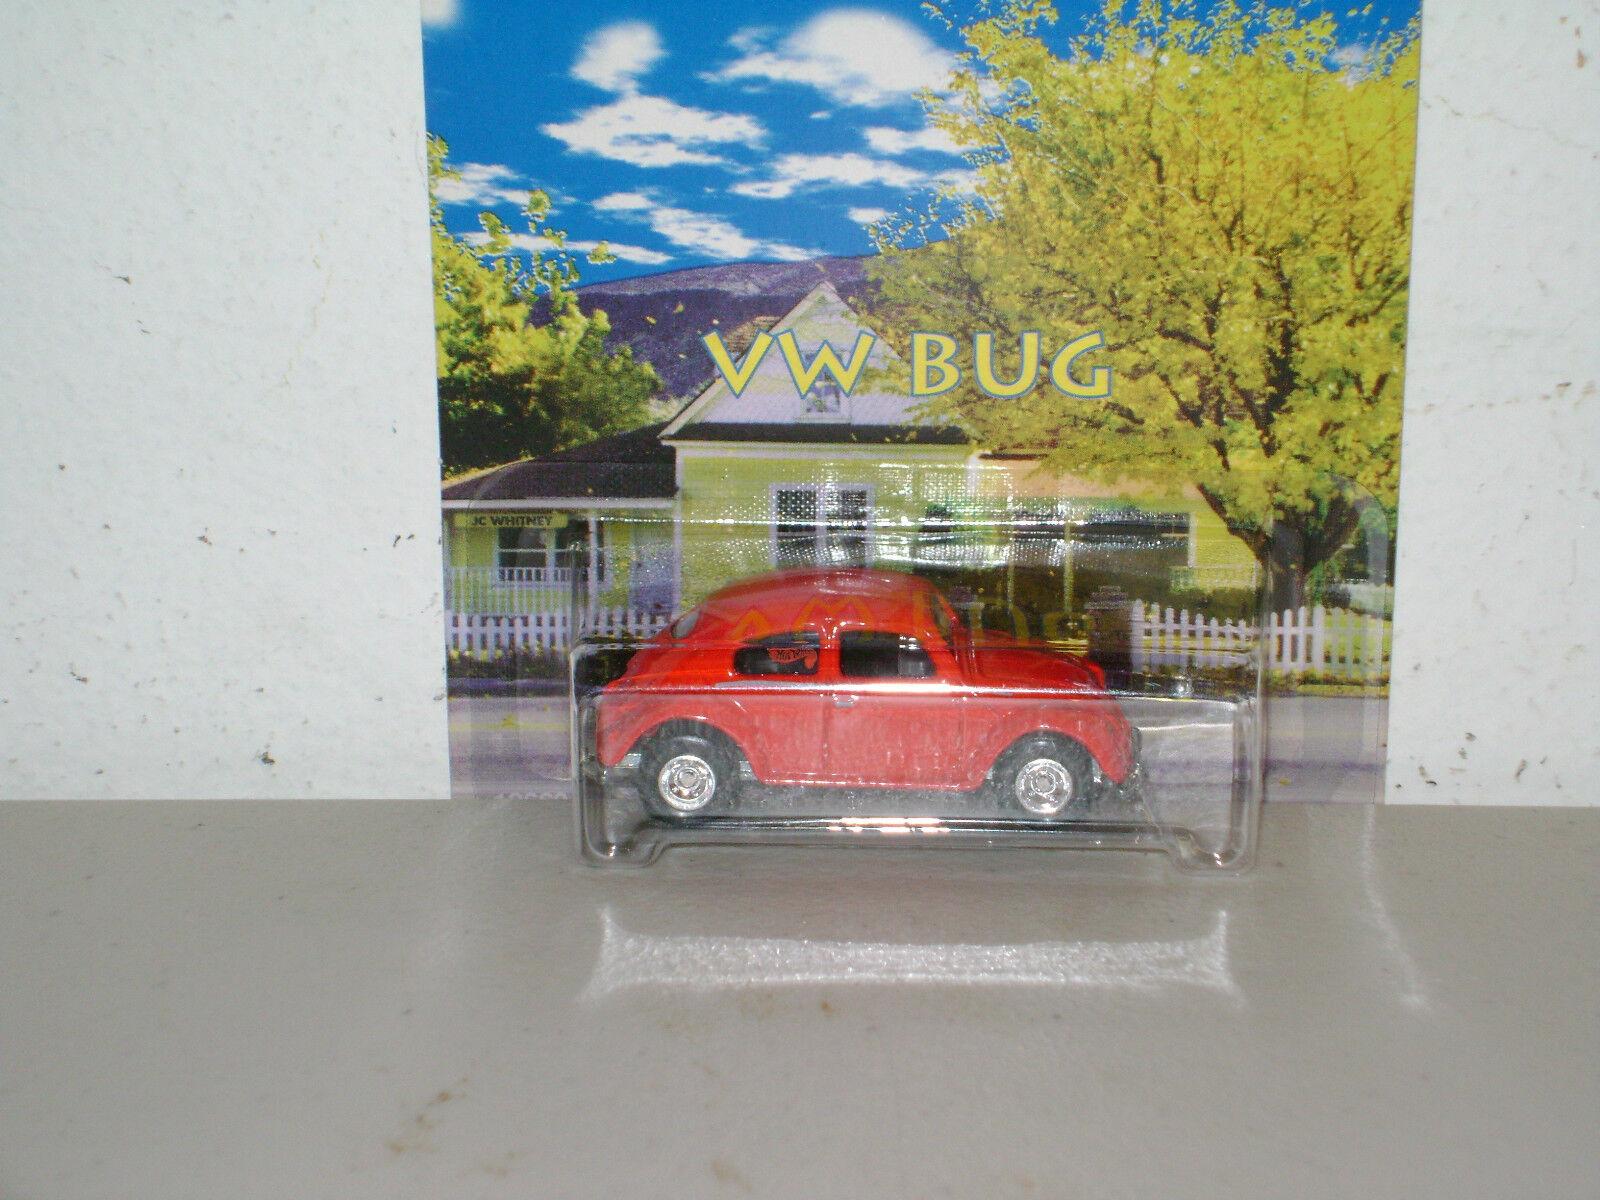 HOT WHEEL `97 JC WHITNEY PROMO VW BUG  MOC  NICE